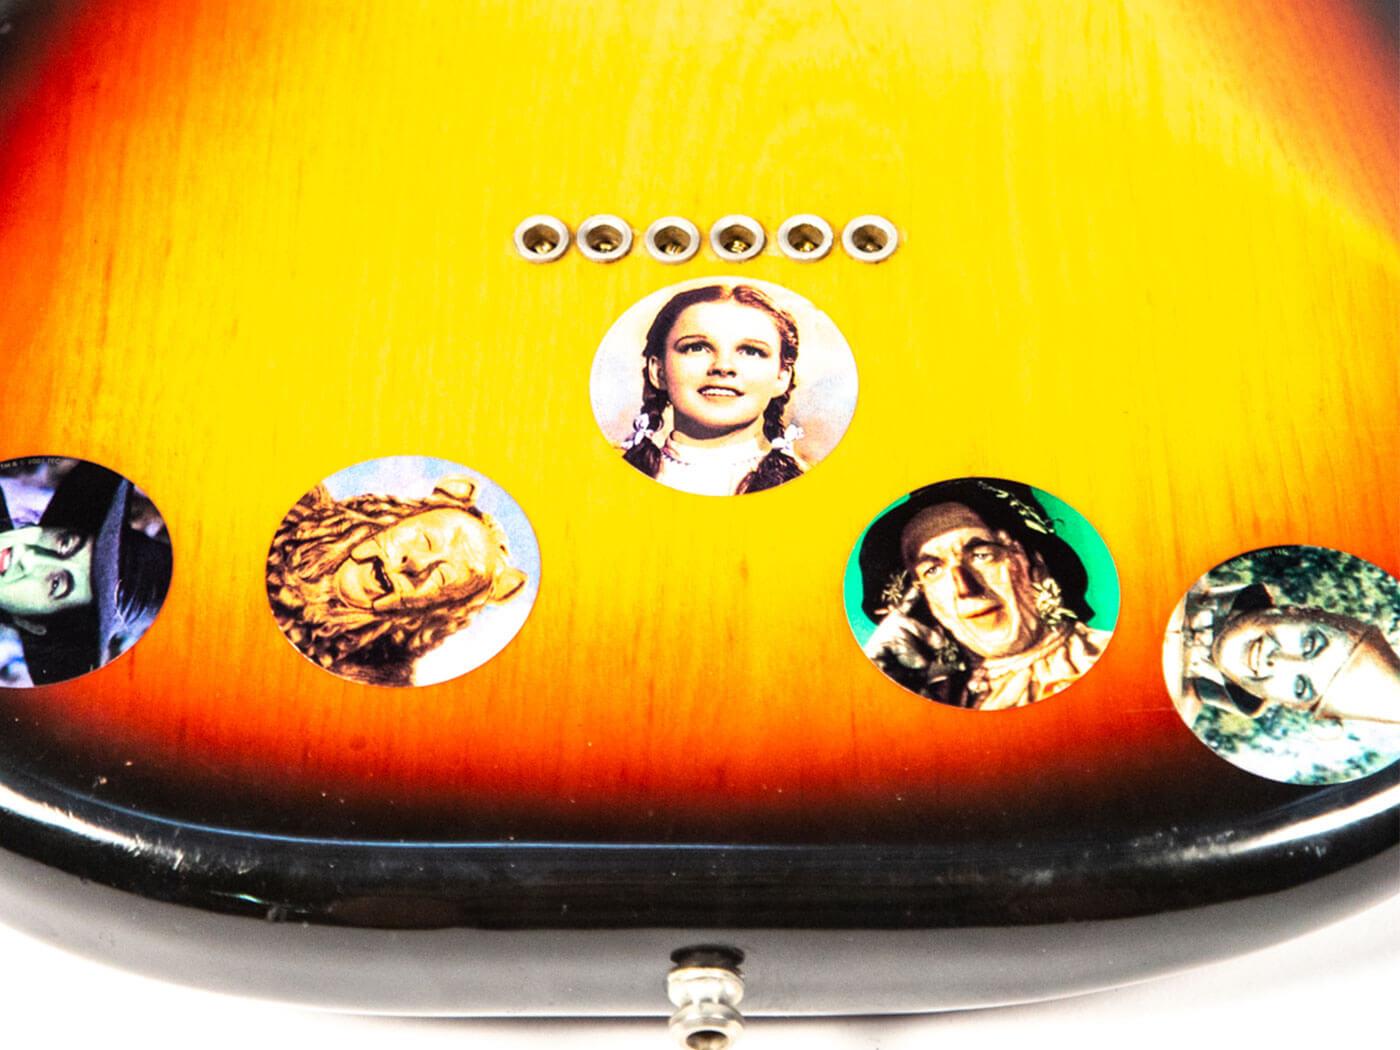 Billy Corgan x Reverb